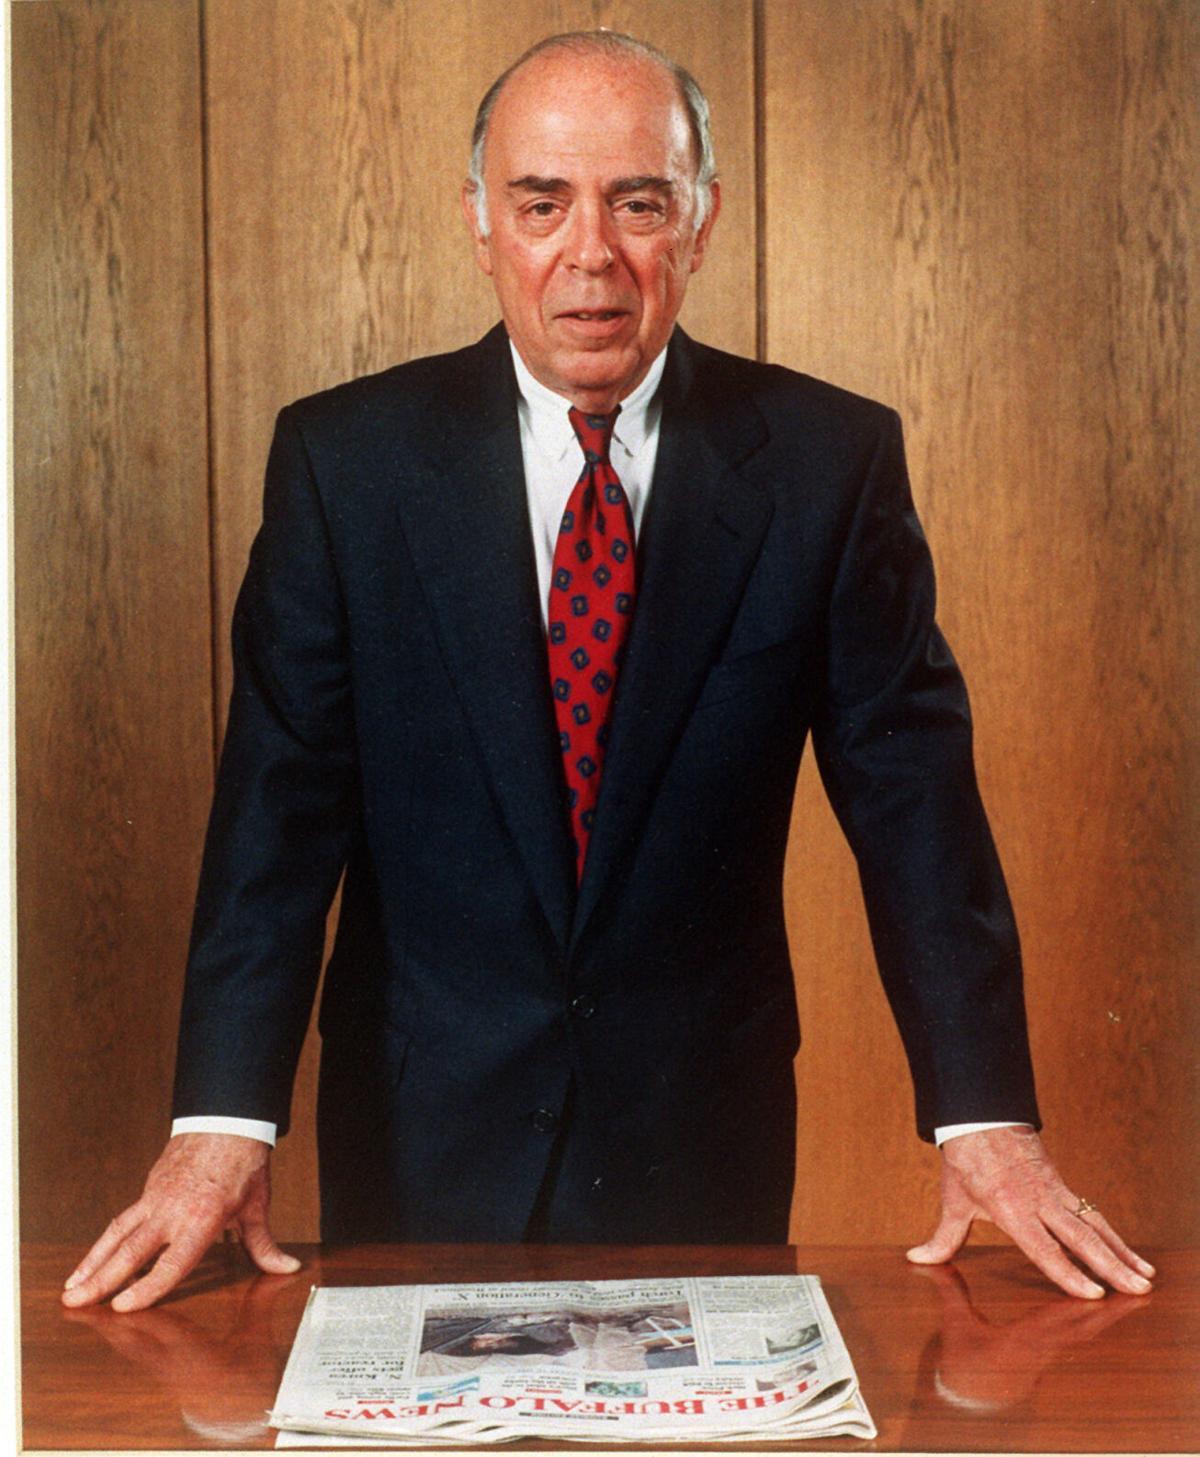 Editor Murray B. Light